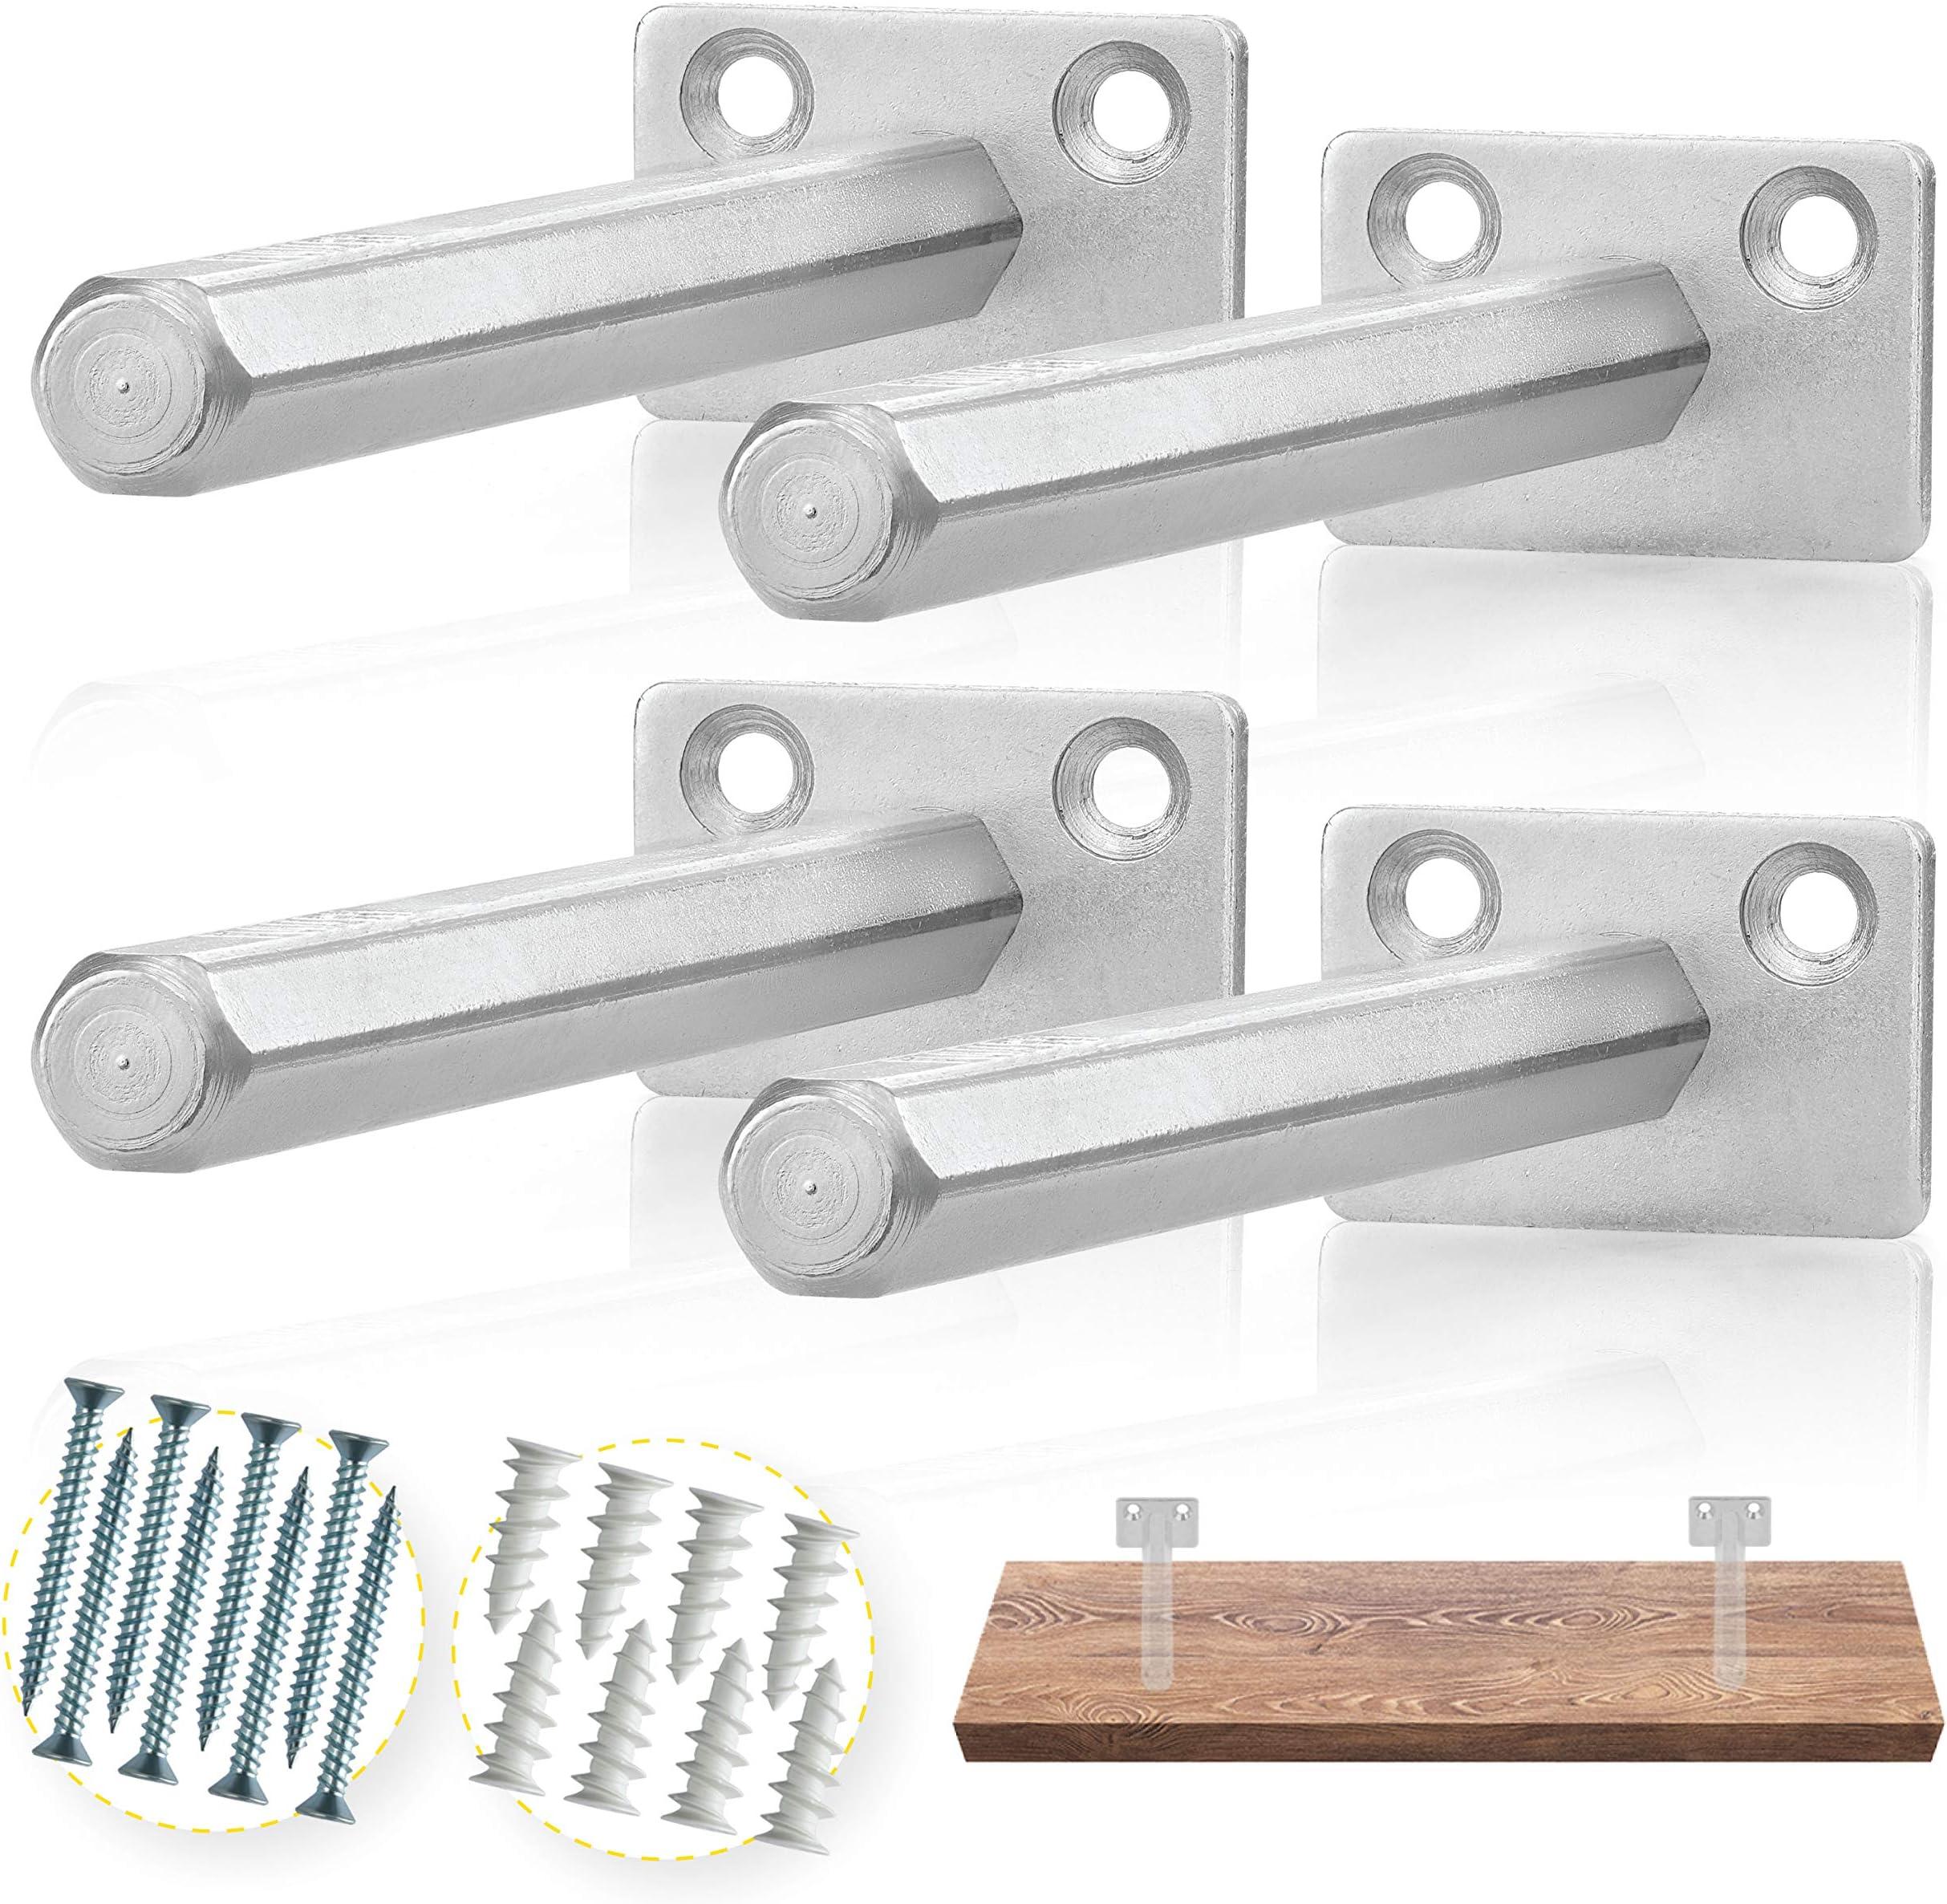 shelf brackets supports amazon com hardware rh amazon com bracket for wood shelves bracket shelves ikea